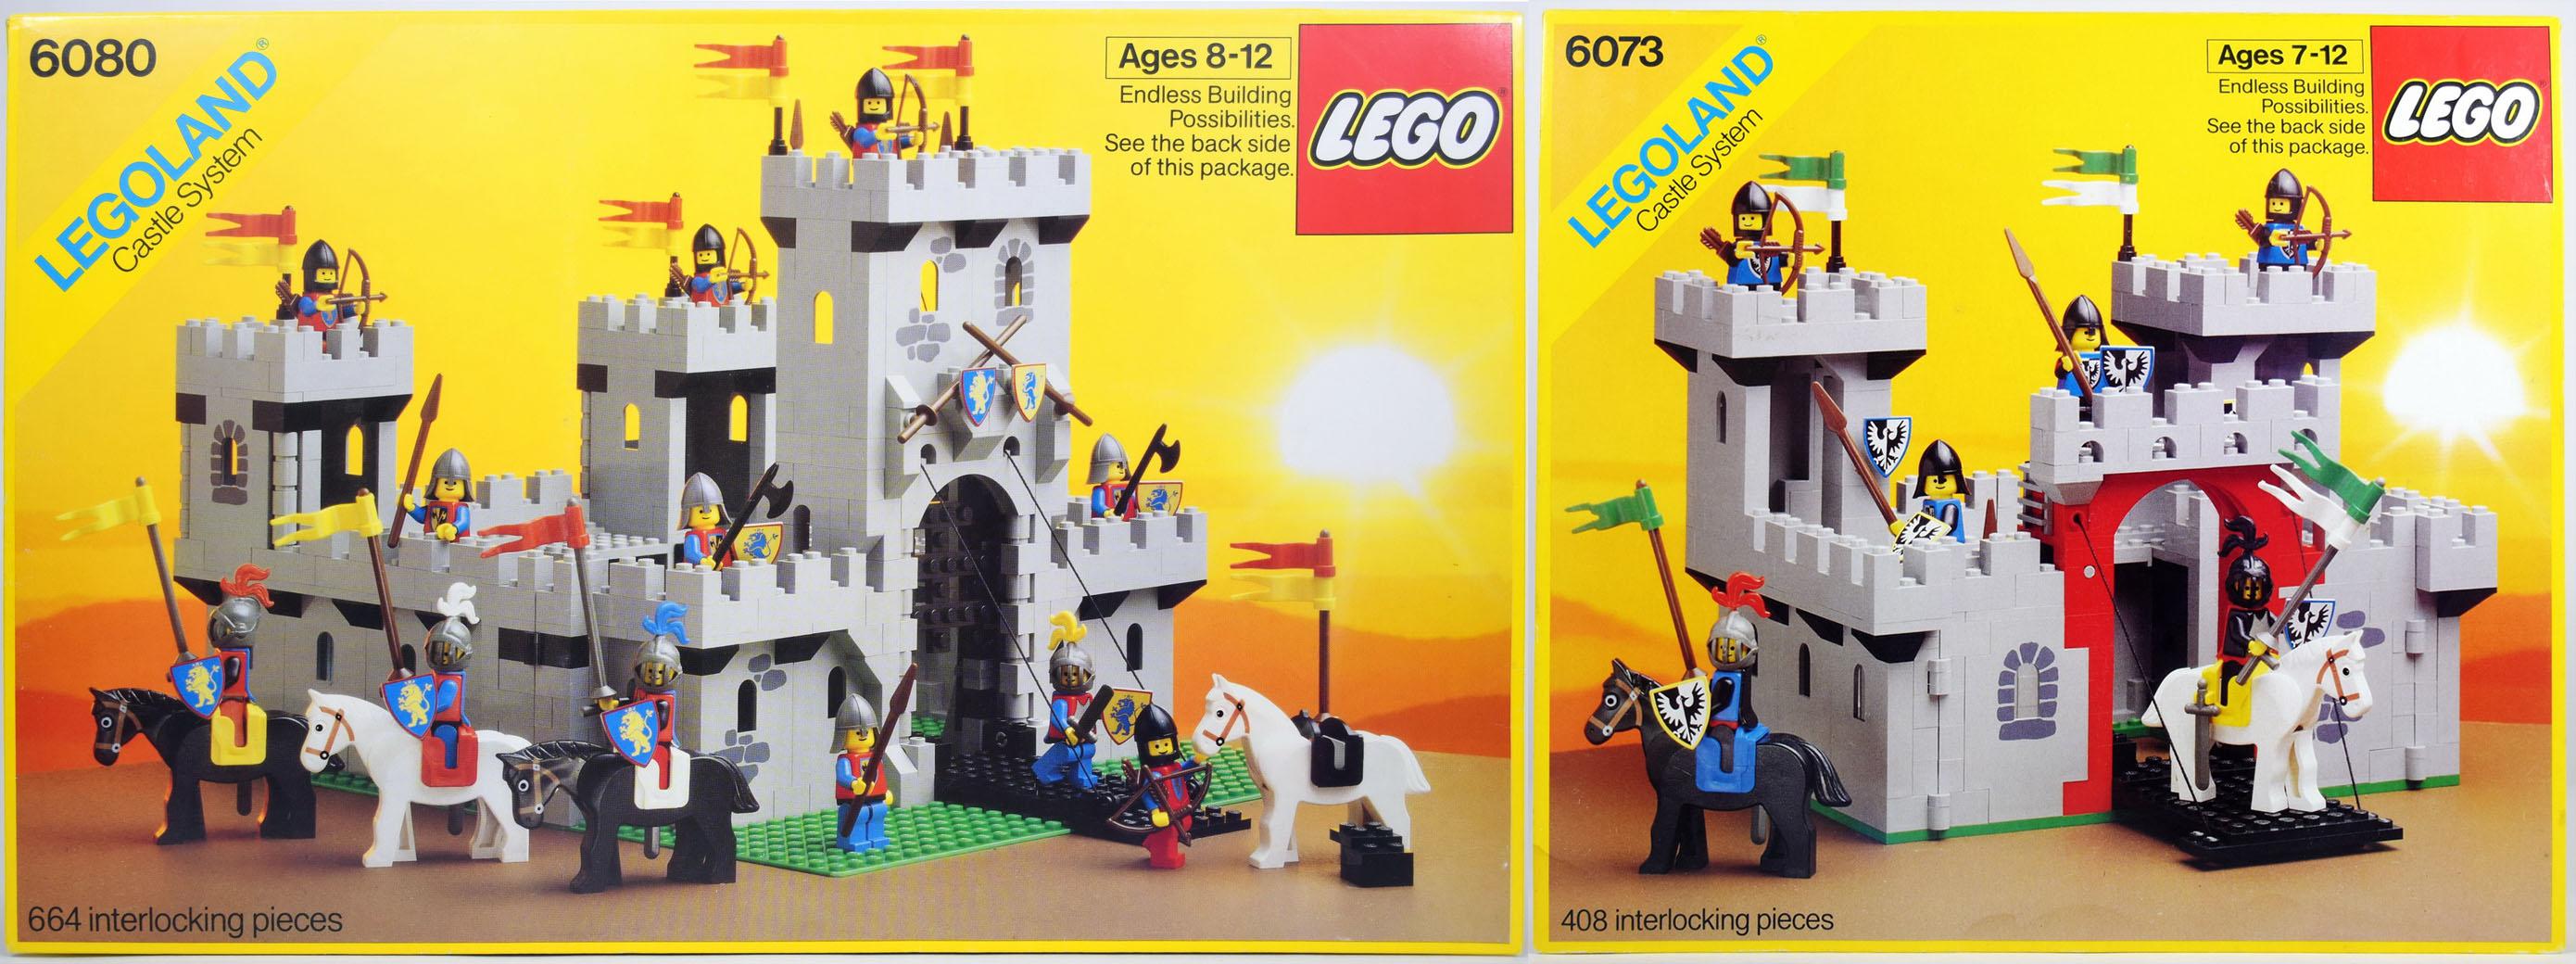 castles lego 1984